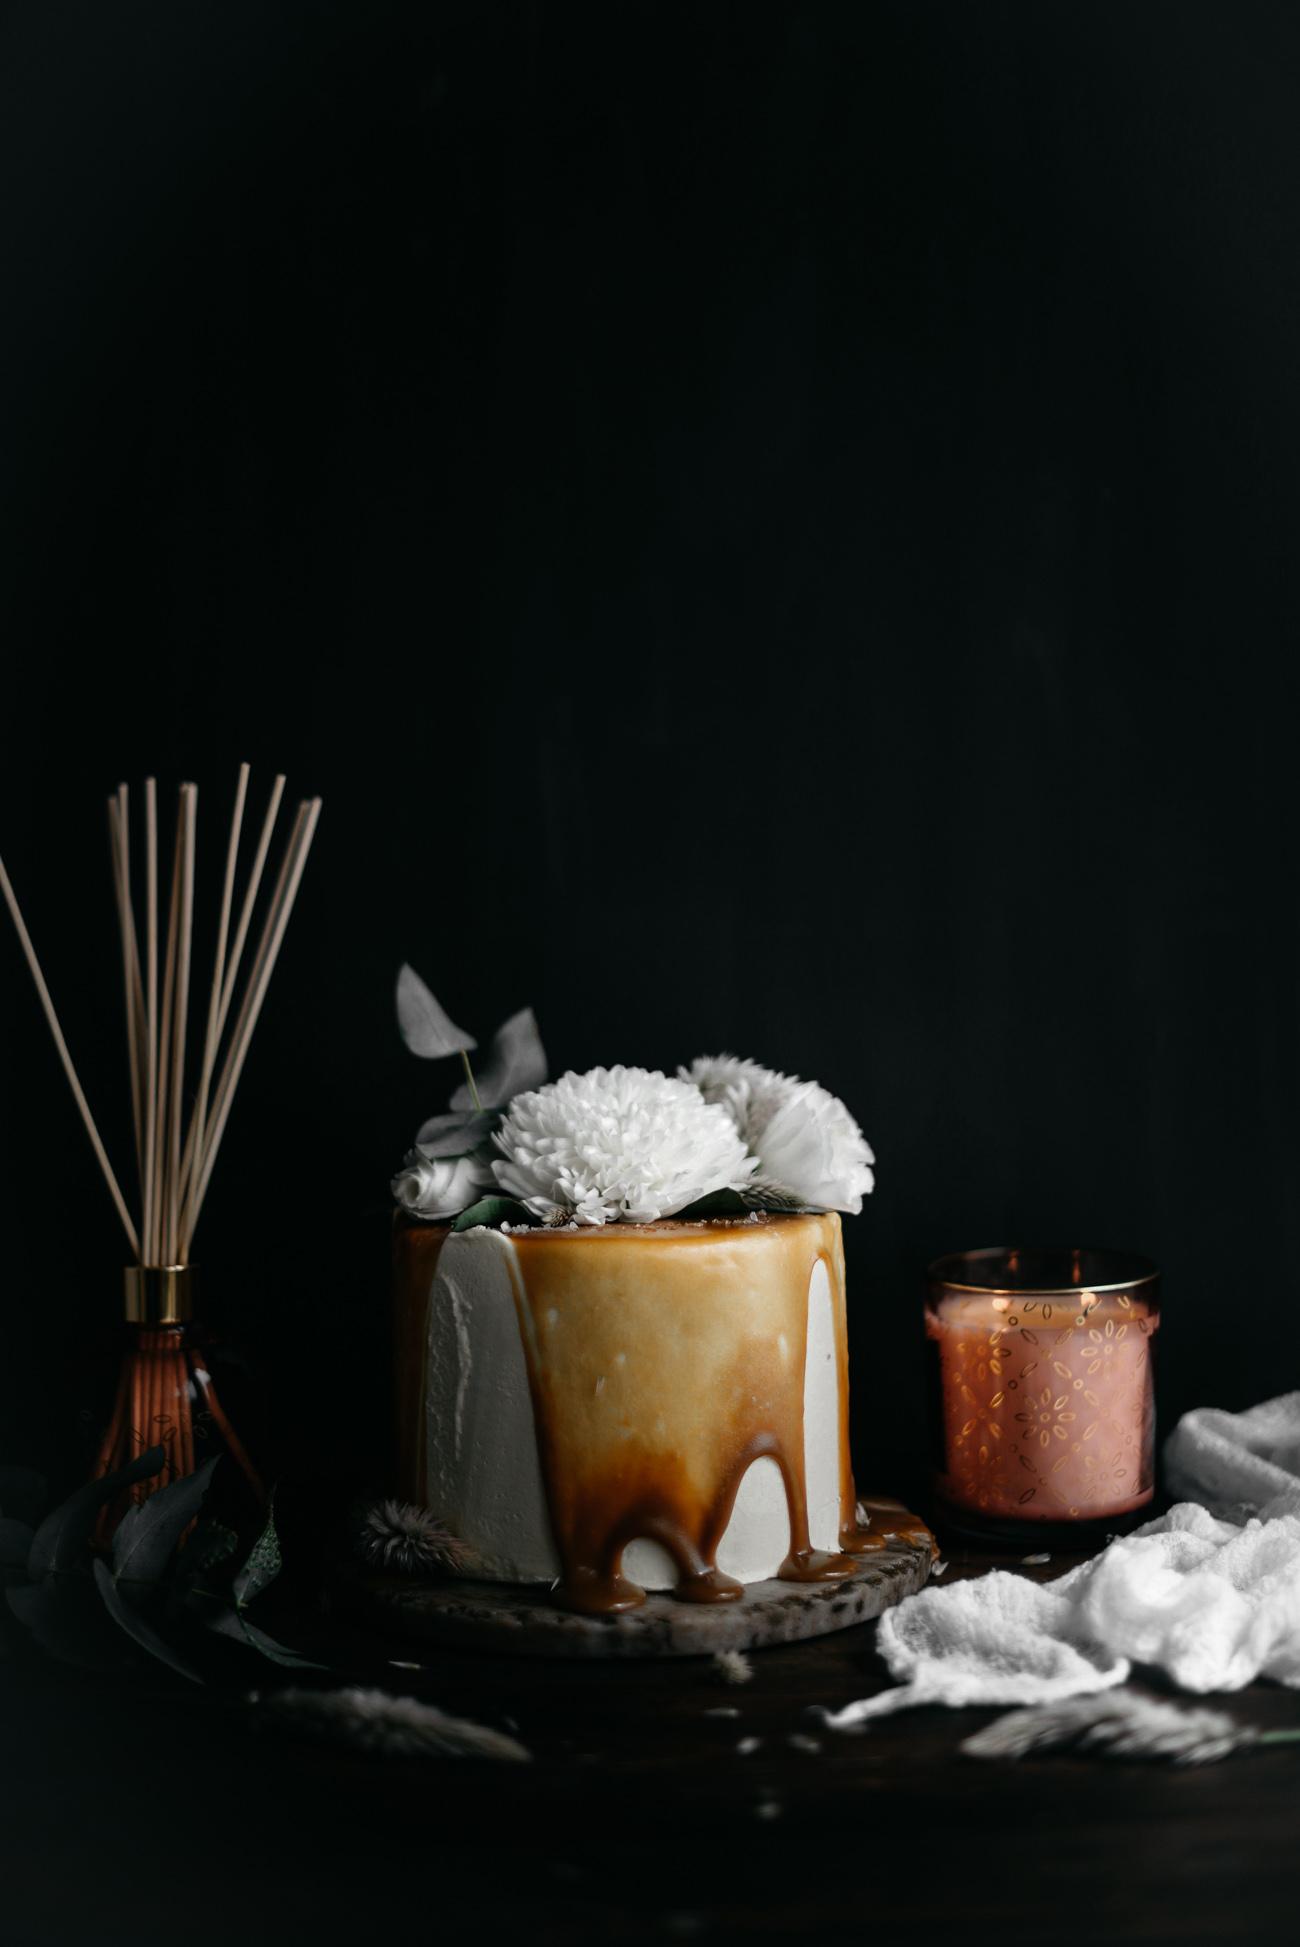 Italian-Orange-Blossom-and-Almond-Cake-with-Orange-Curd-Mascarpone-Swiss-Meringue-Buttercream-and-Fleur-d'Oranger-Caramel-2.jpg